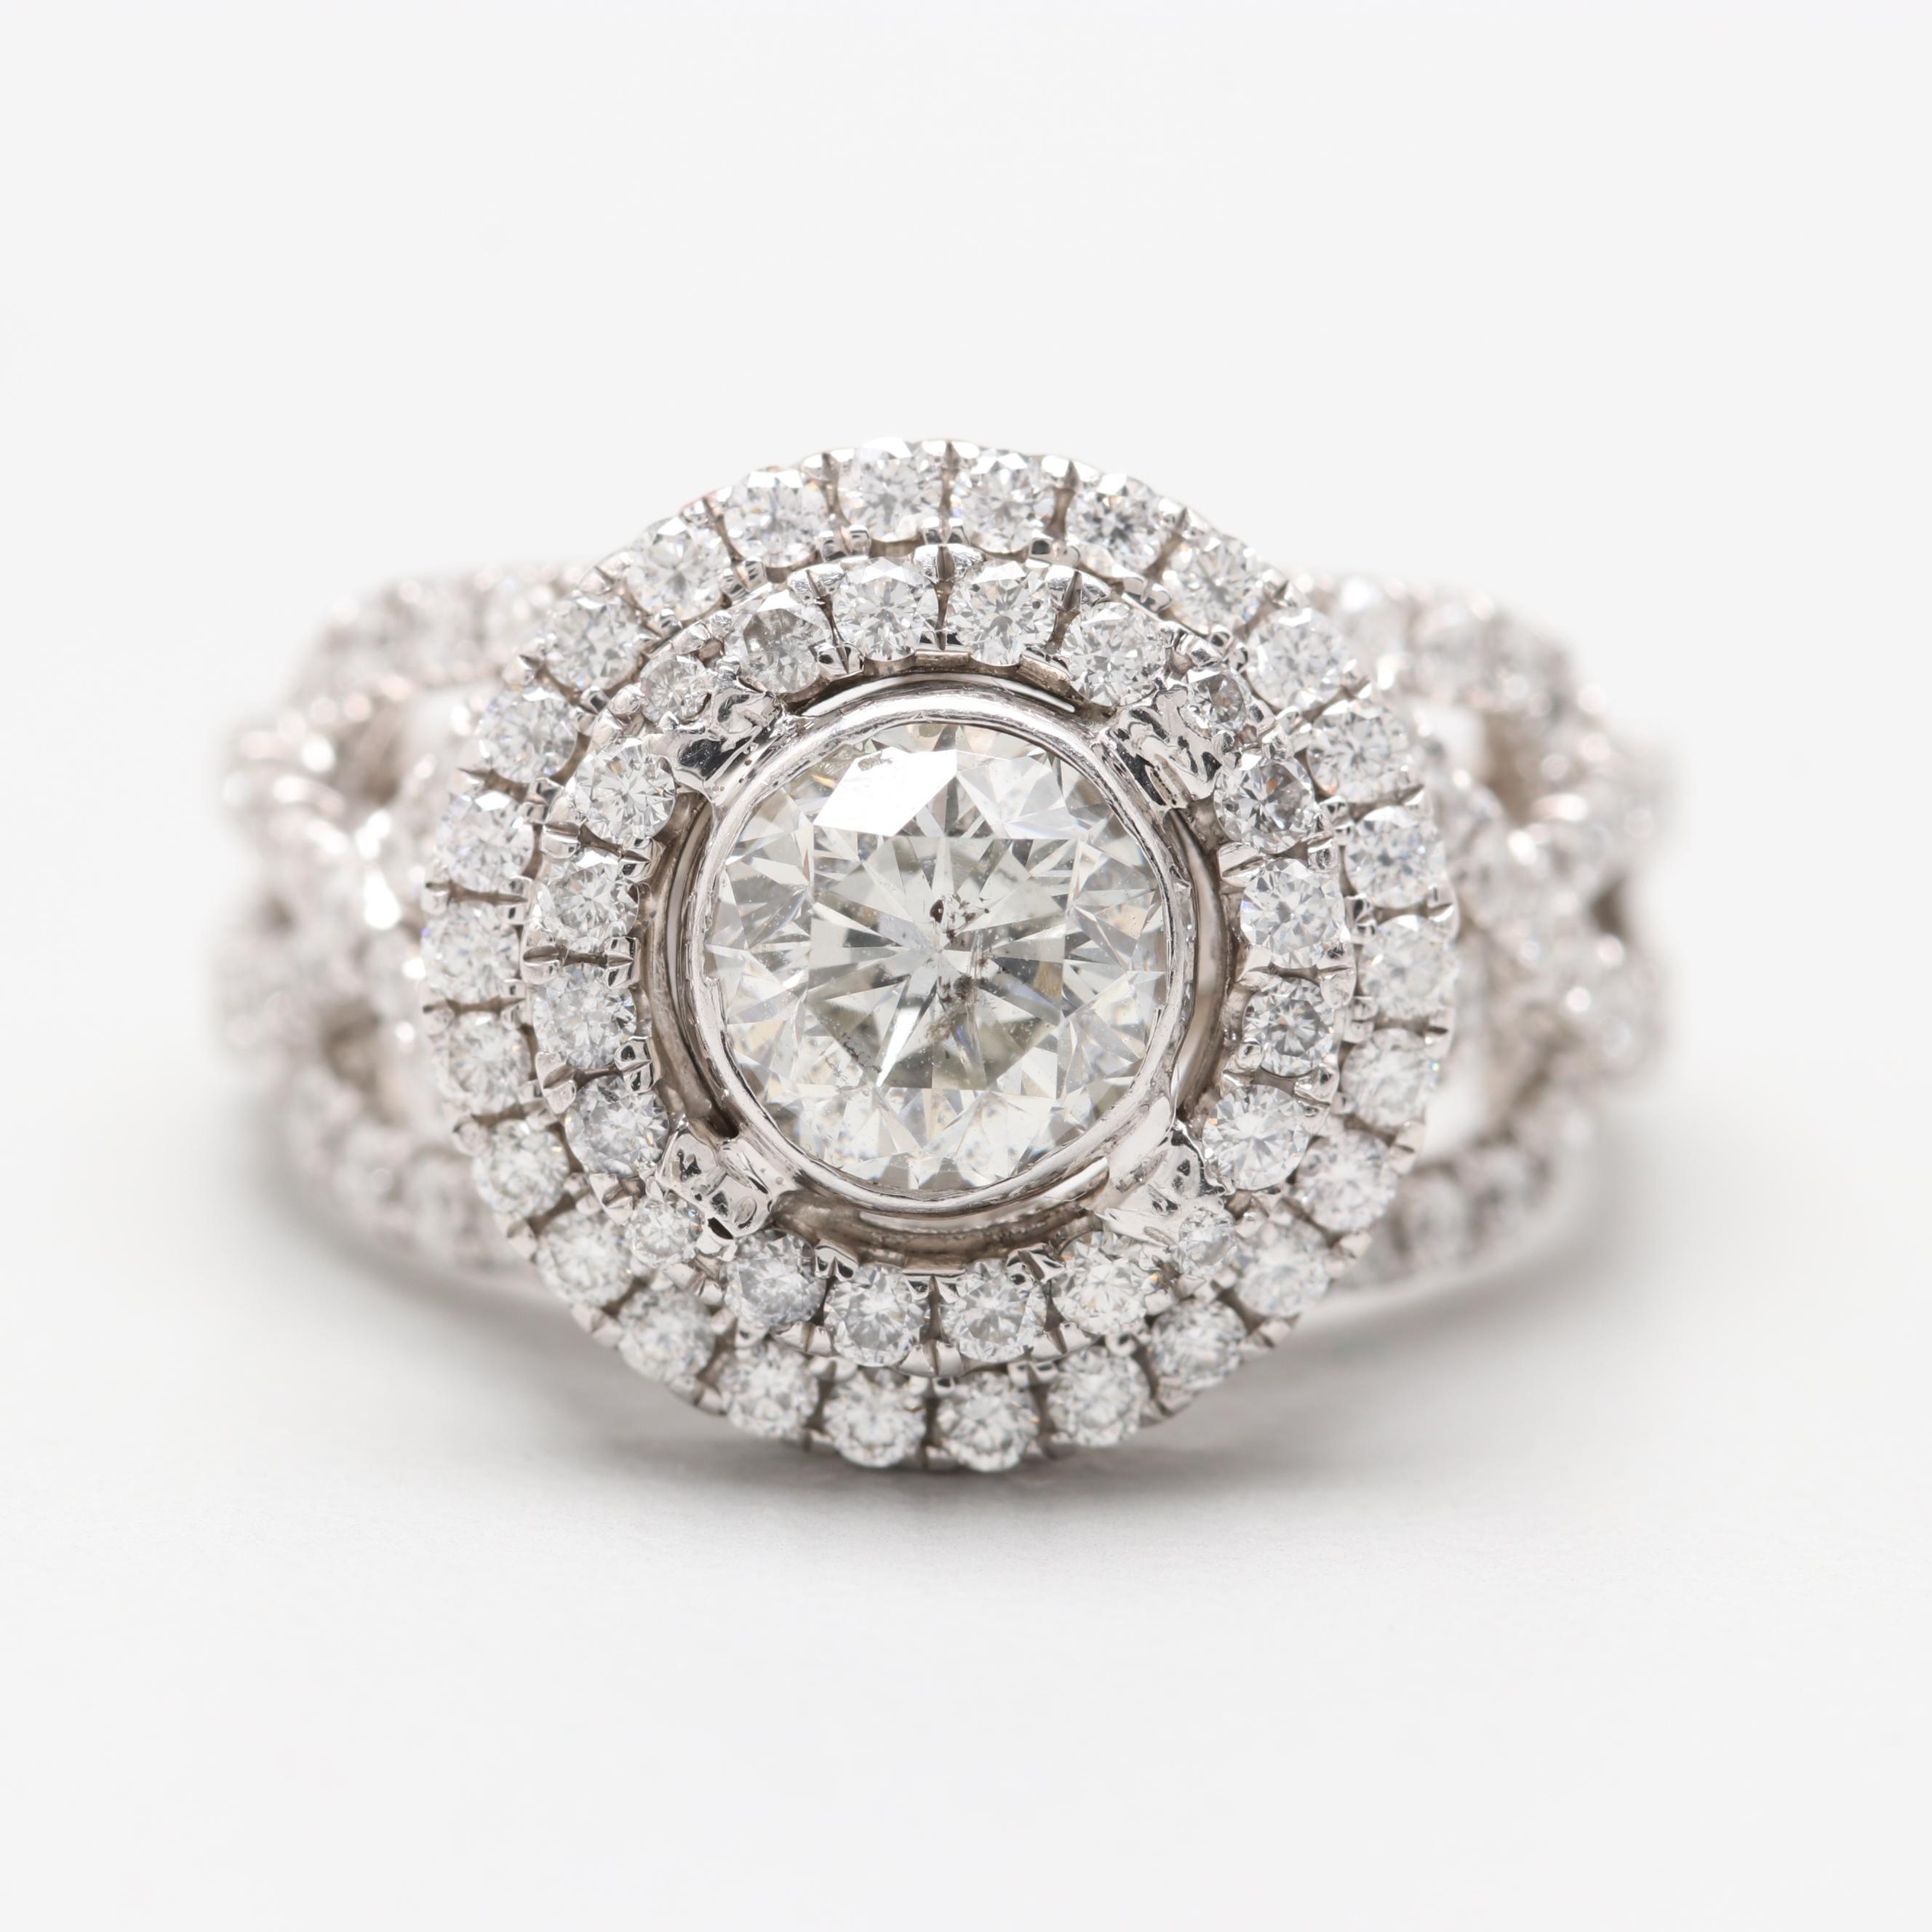 18K White Gold 2.18 CTW Diamond Ring